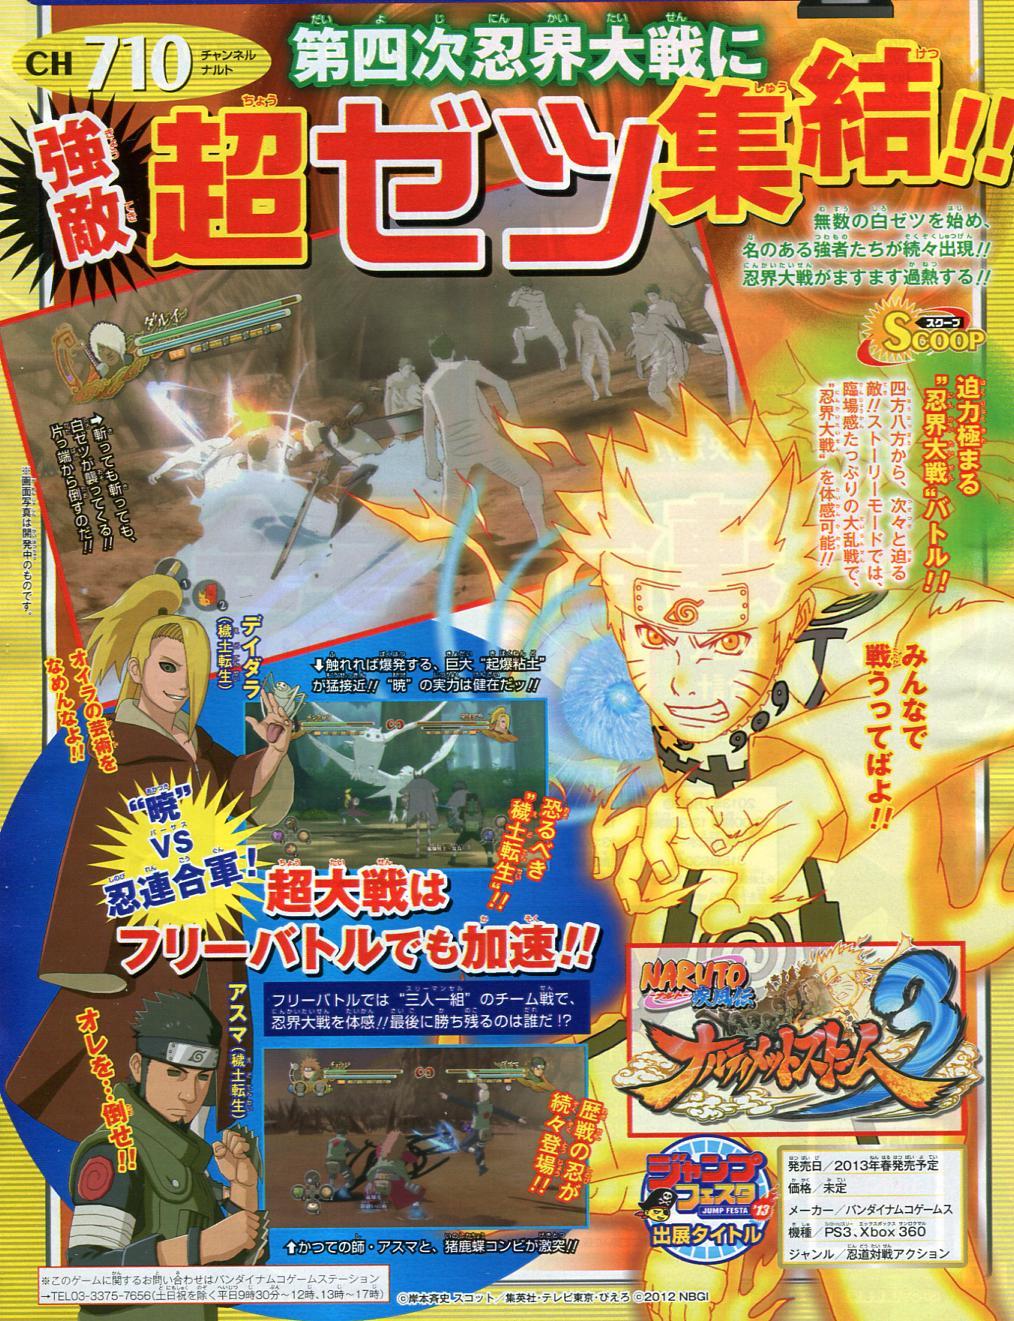 http://game-saga.com/wp-content/uploads/2018/12/naruto-shippuden-ultimate-ninja-storm-3-scan-1.jpg